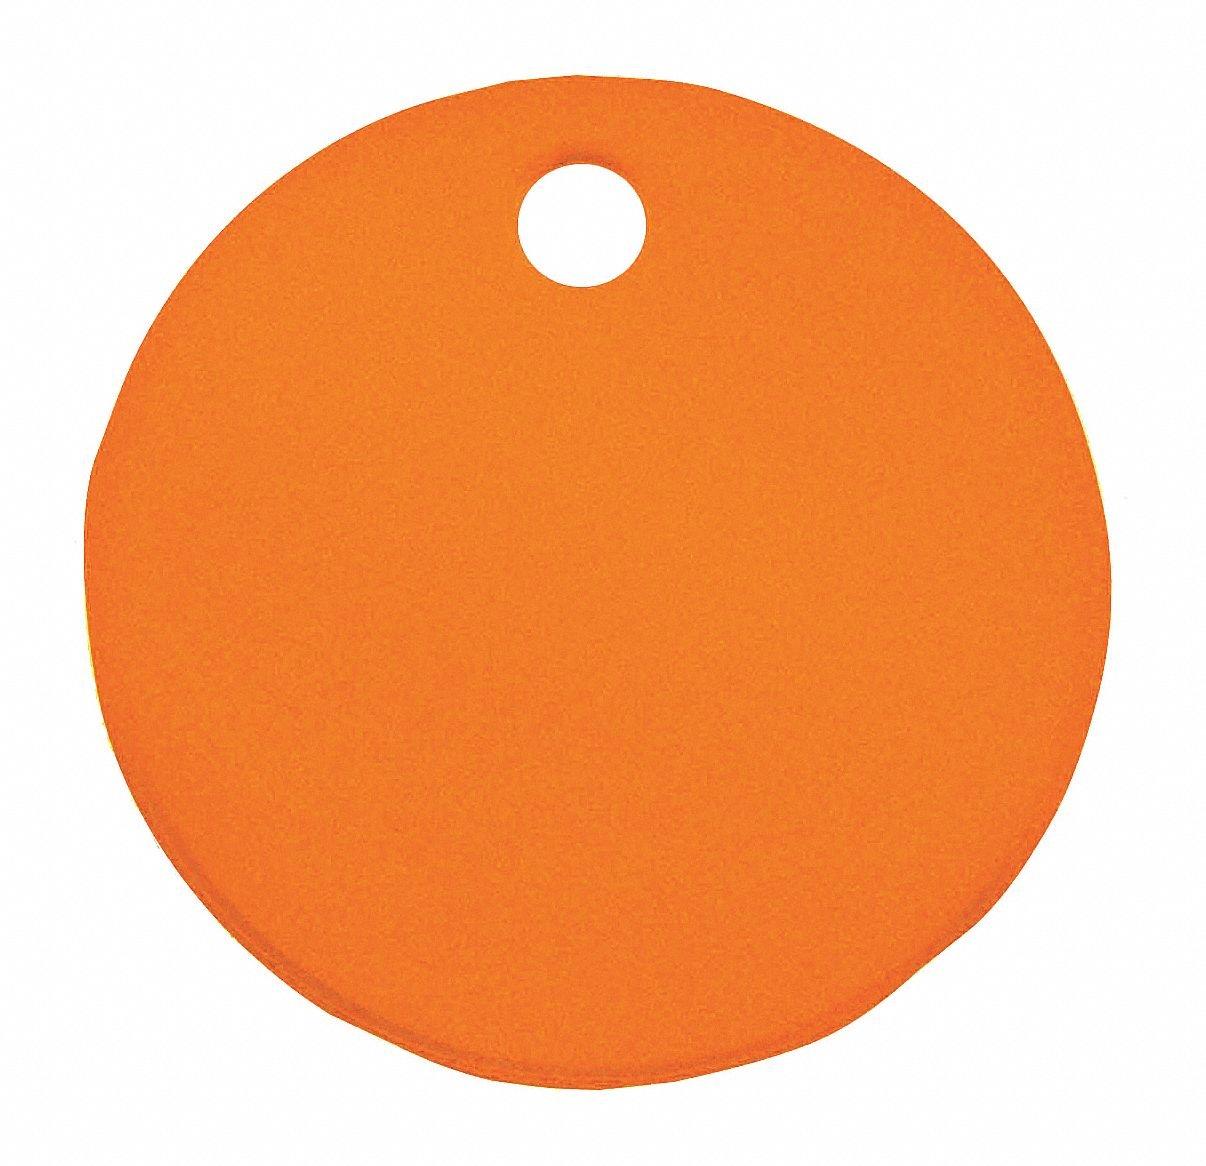 Orange Blank Tag, Aluminum, Round, 1'' Height, 5 PK